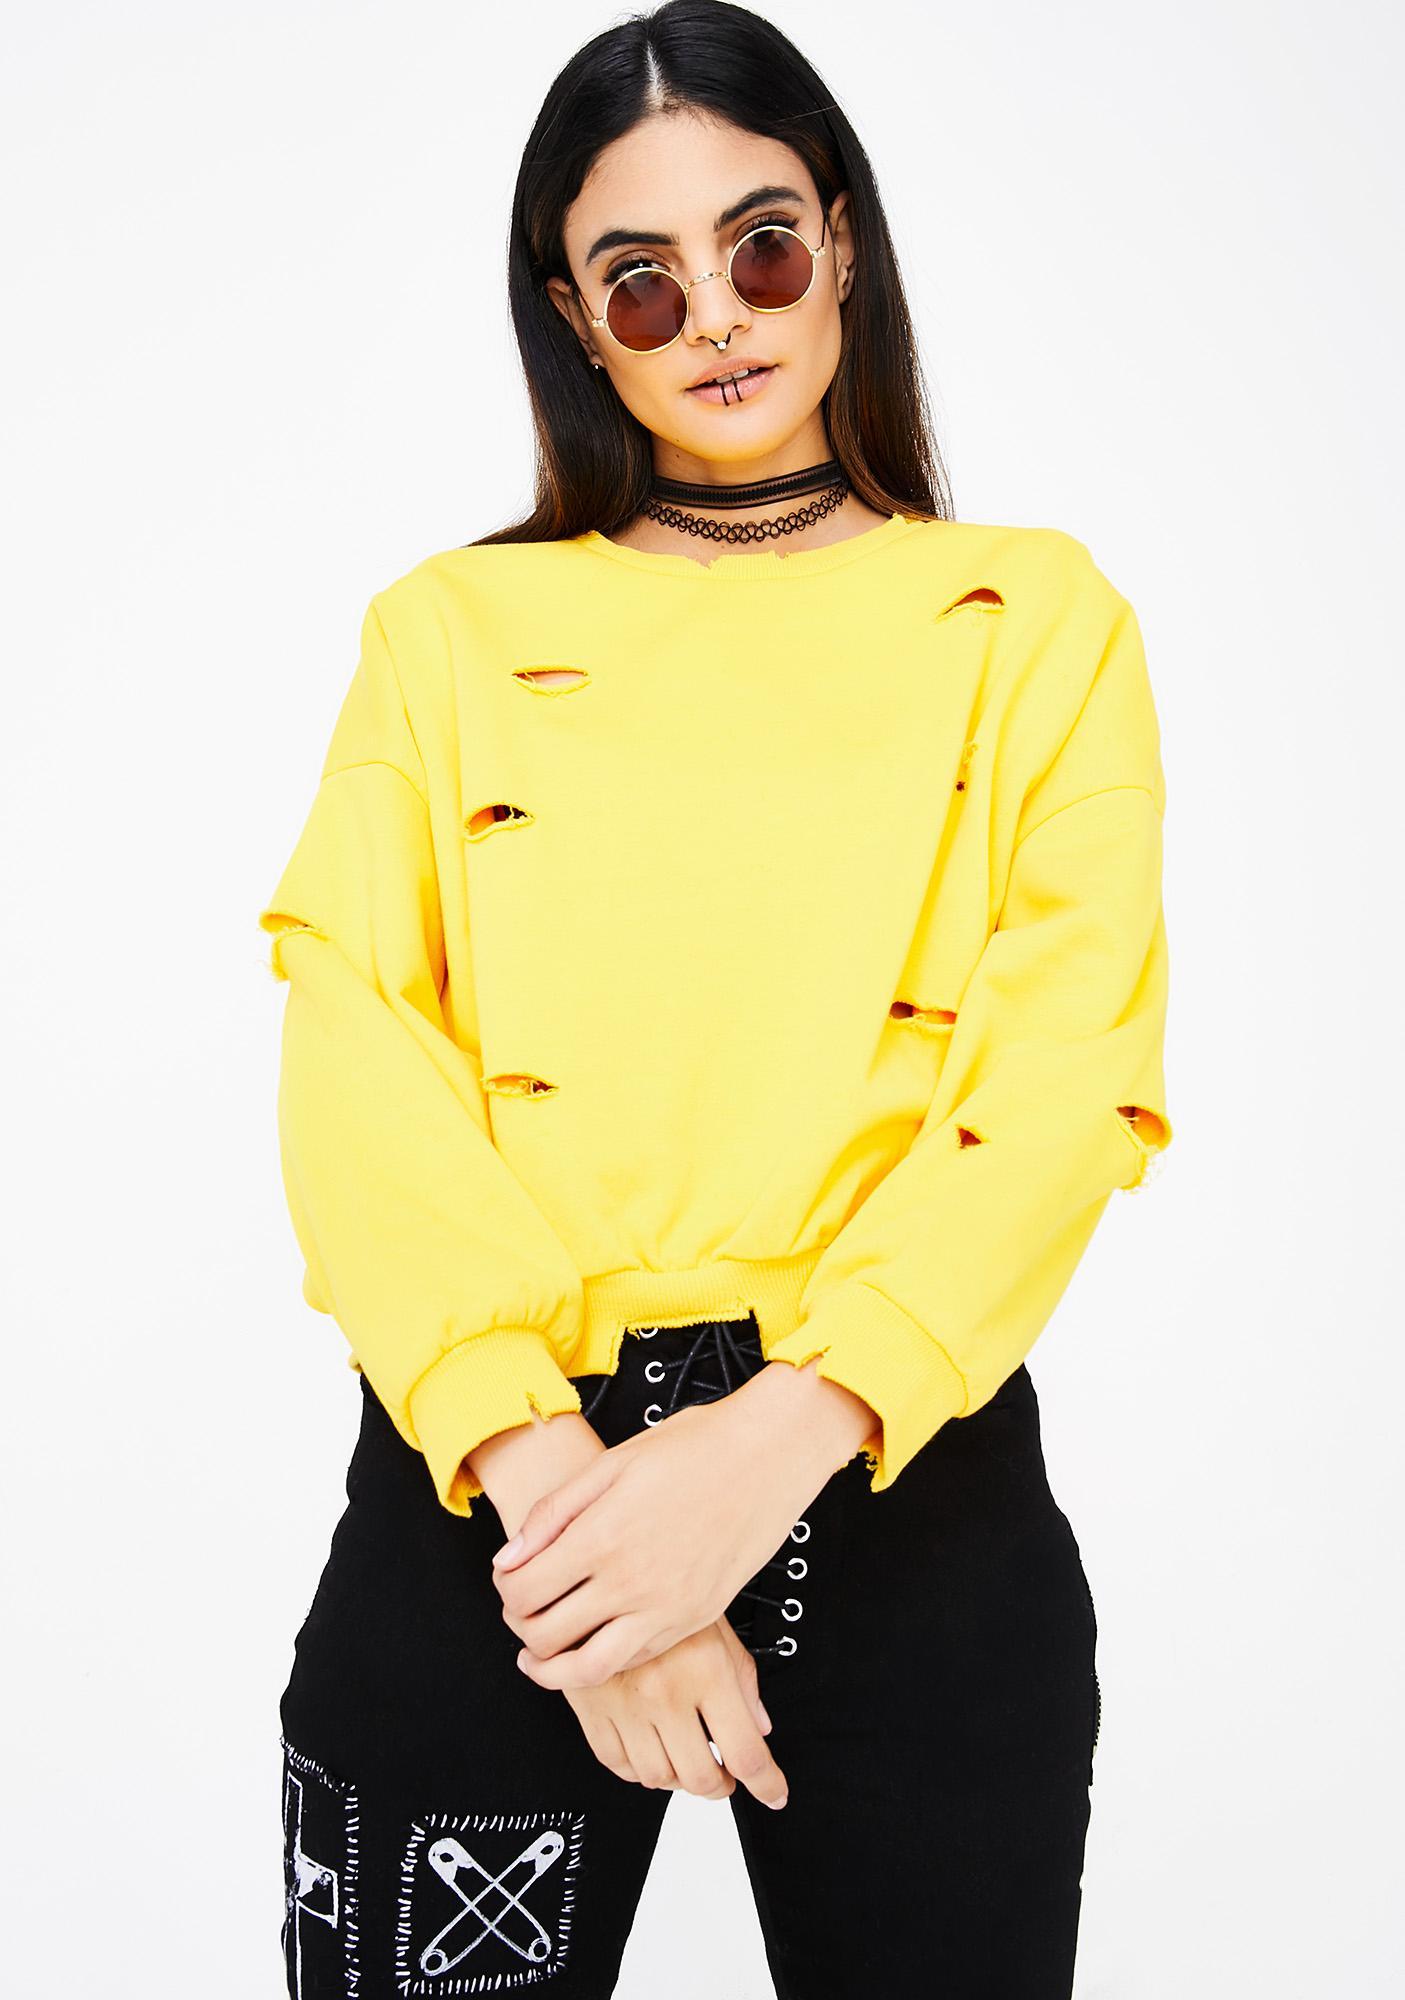 Daisy In The Rough Sweatshirt